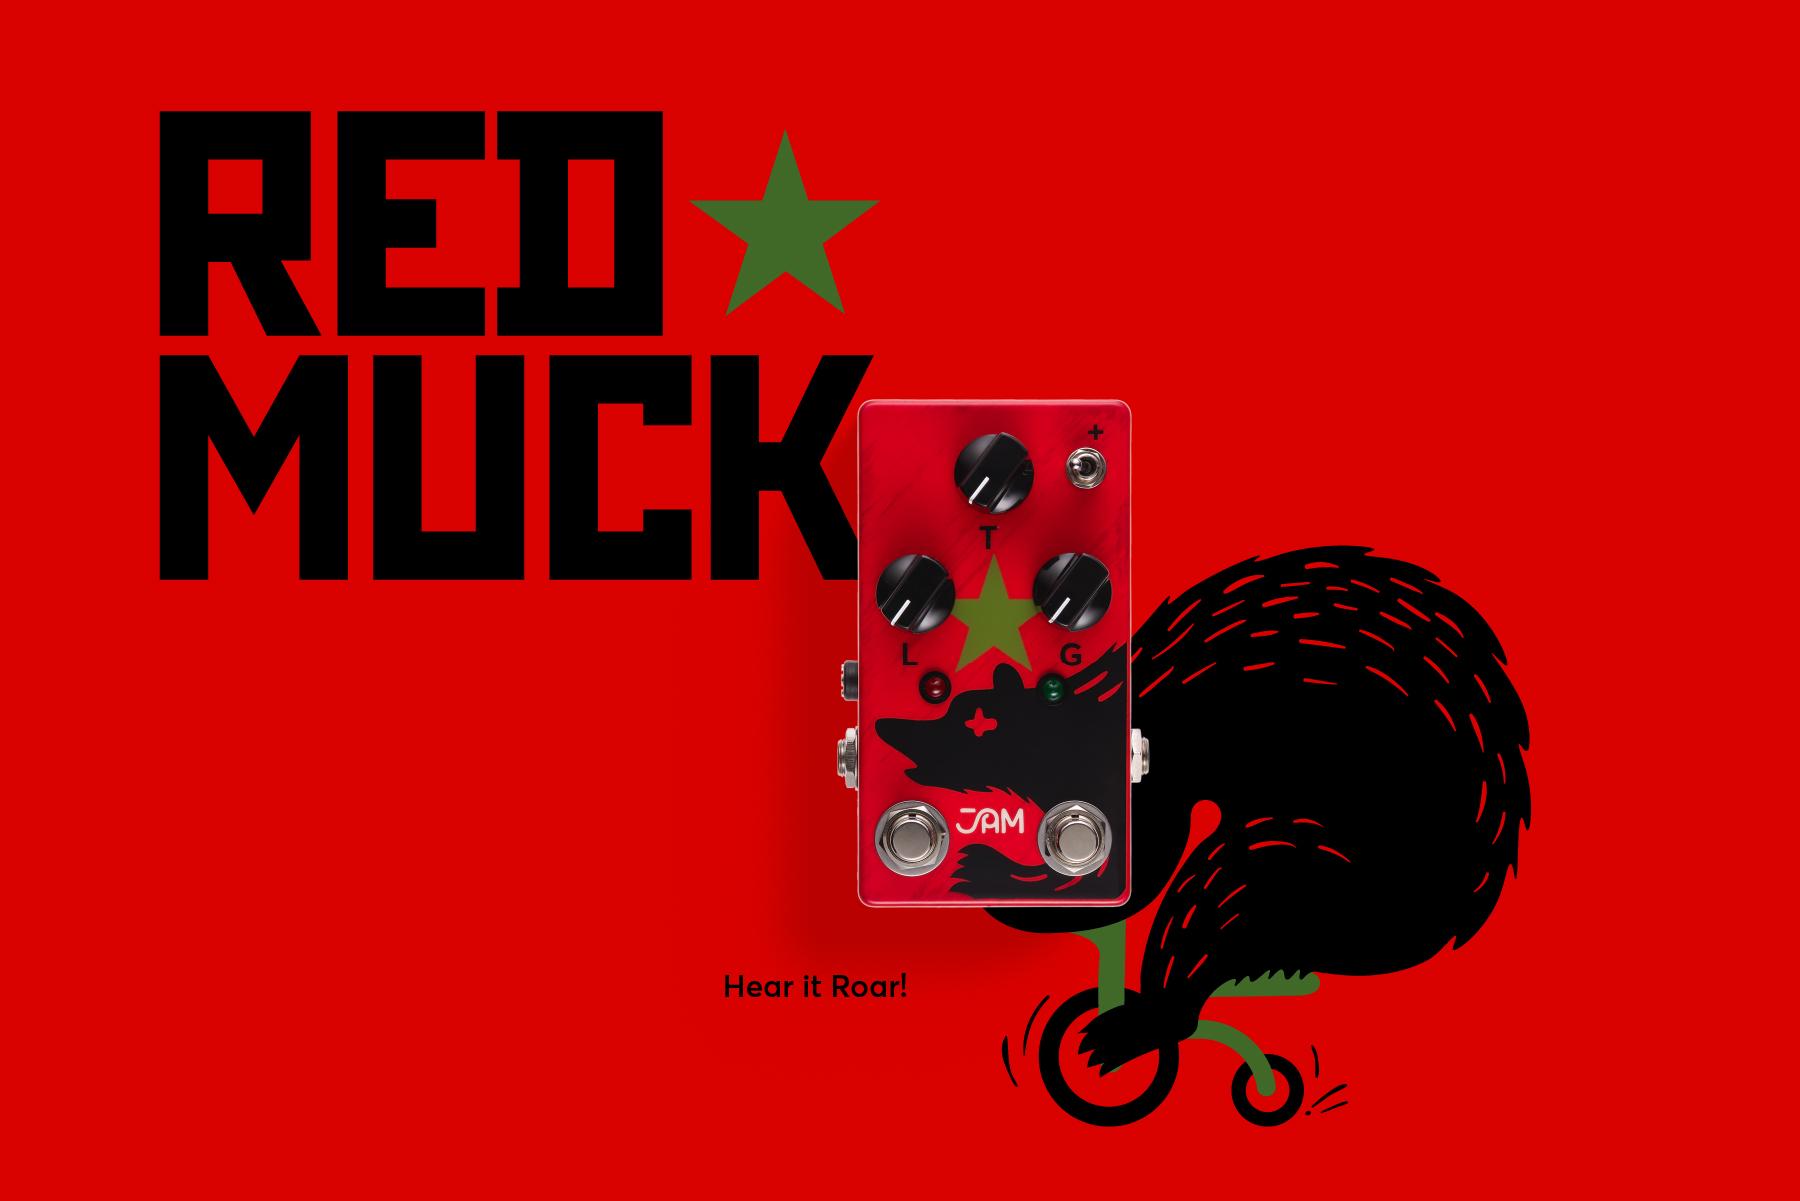 Red Muck mk.2